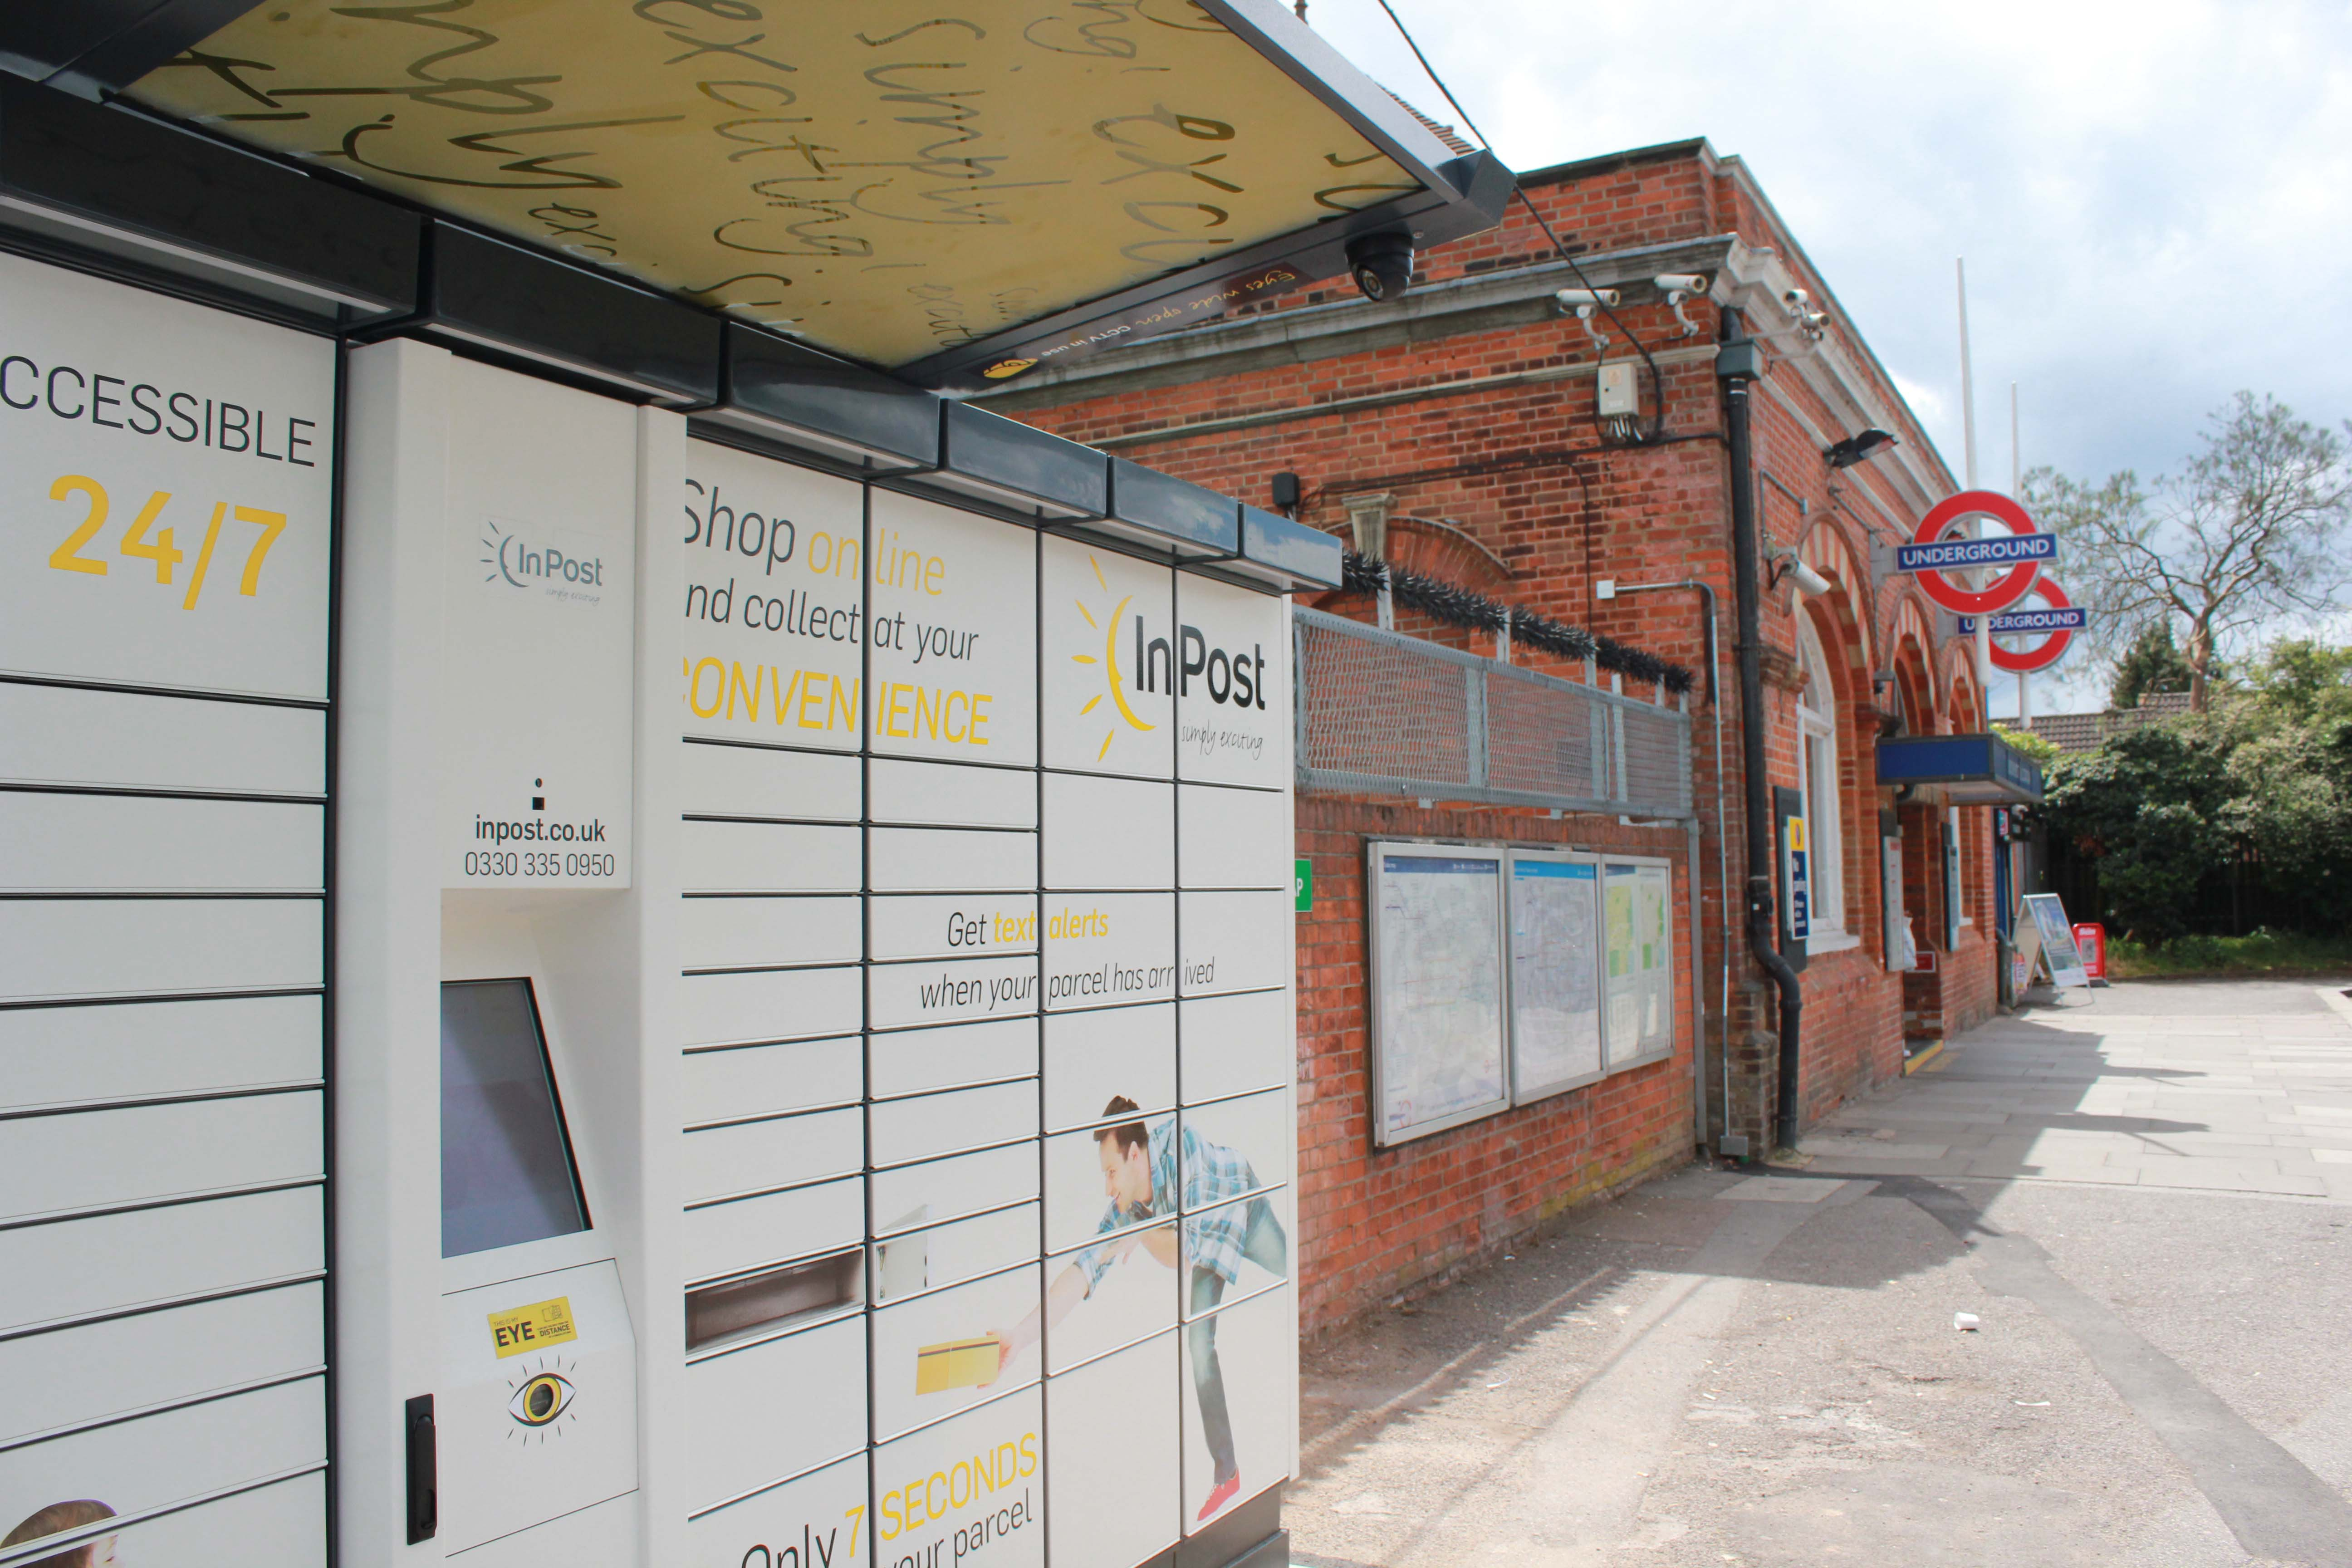 Holland & Barrett offers customers InPost locker option